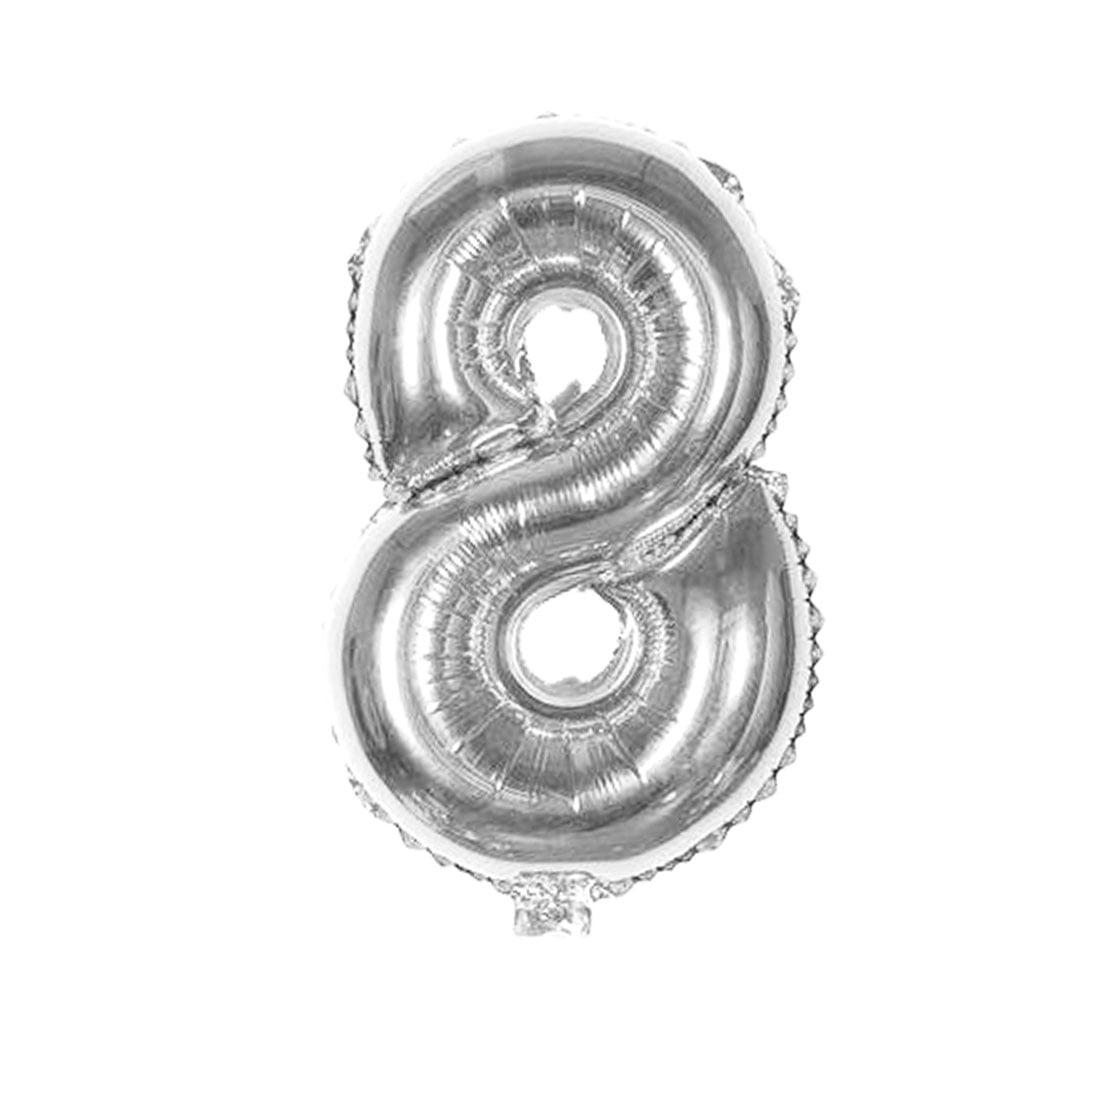 "Unique Bargains Foil Number 8 Shape Helium Balloon Birthday Wedding Decor Silver Tone 16"""